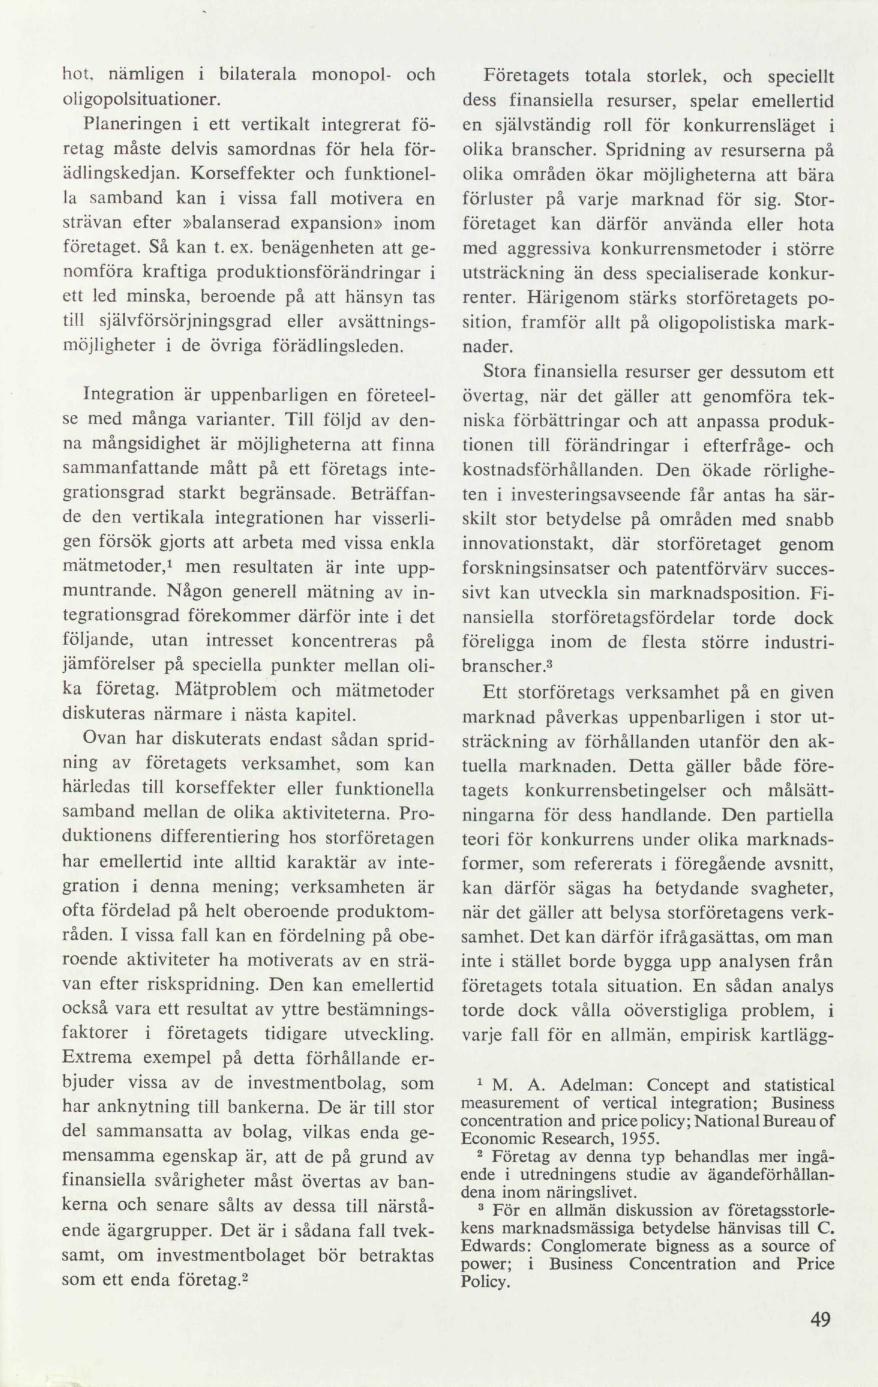 Stenbecks dod blandad kursutveckling for stenbeckforetagen